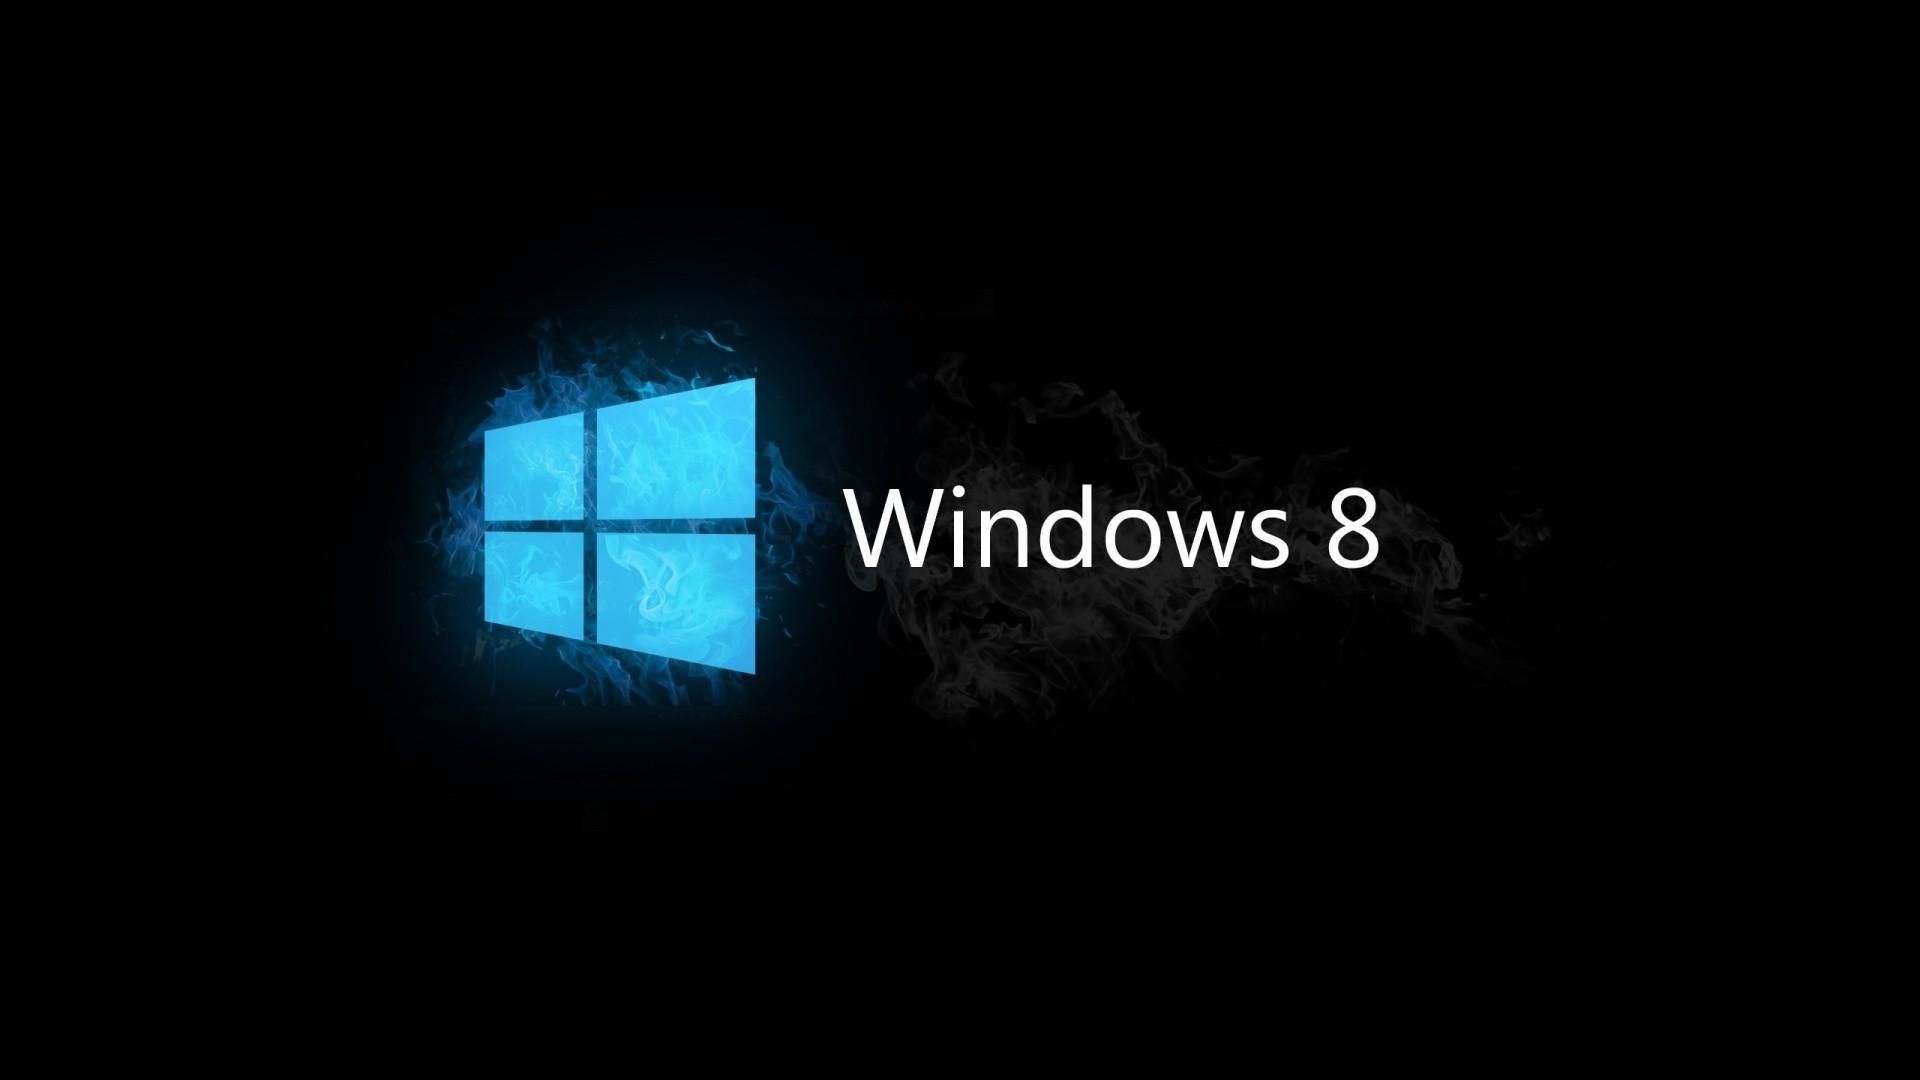 Windows 8 Blue desktop PC and Mac wallpaper